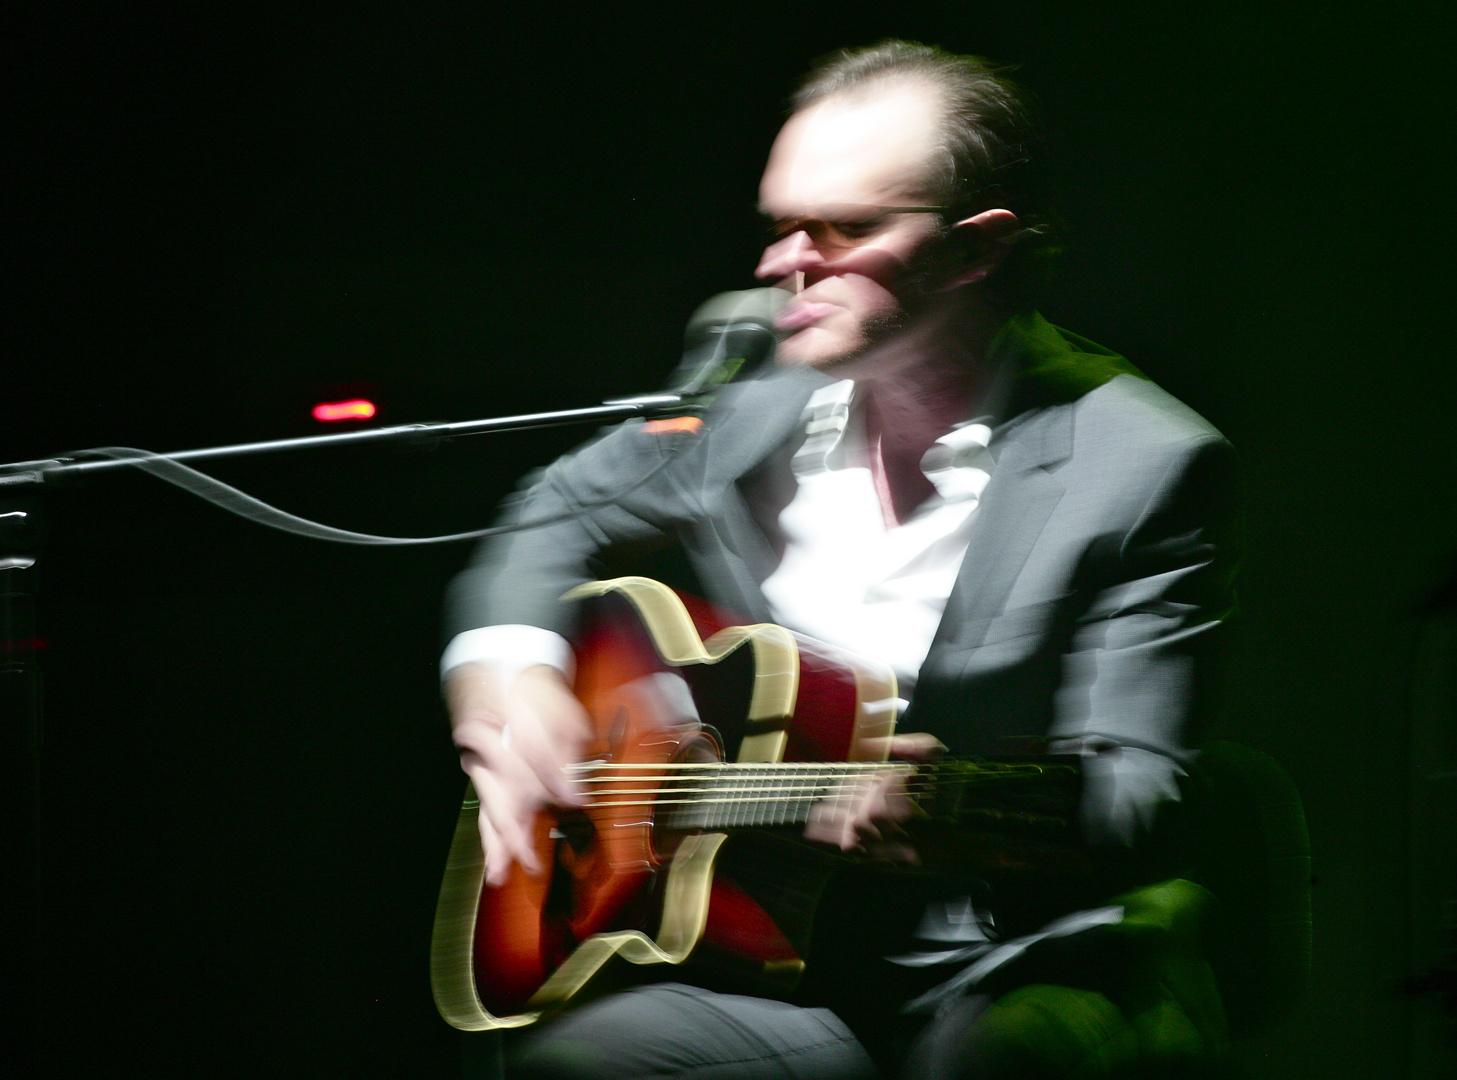 Joe Bonamassa Acoustic Set Konzerthaus Freiburg 7.3.2013